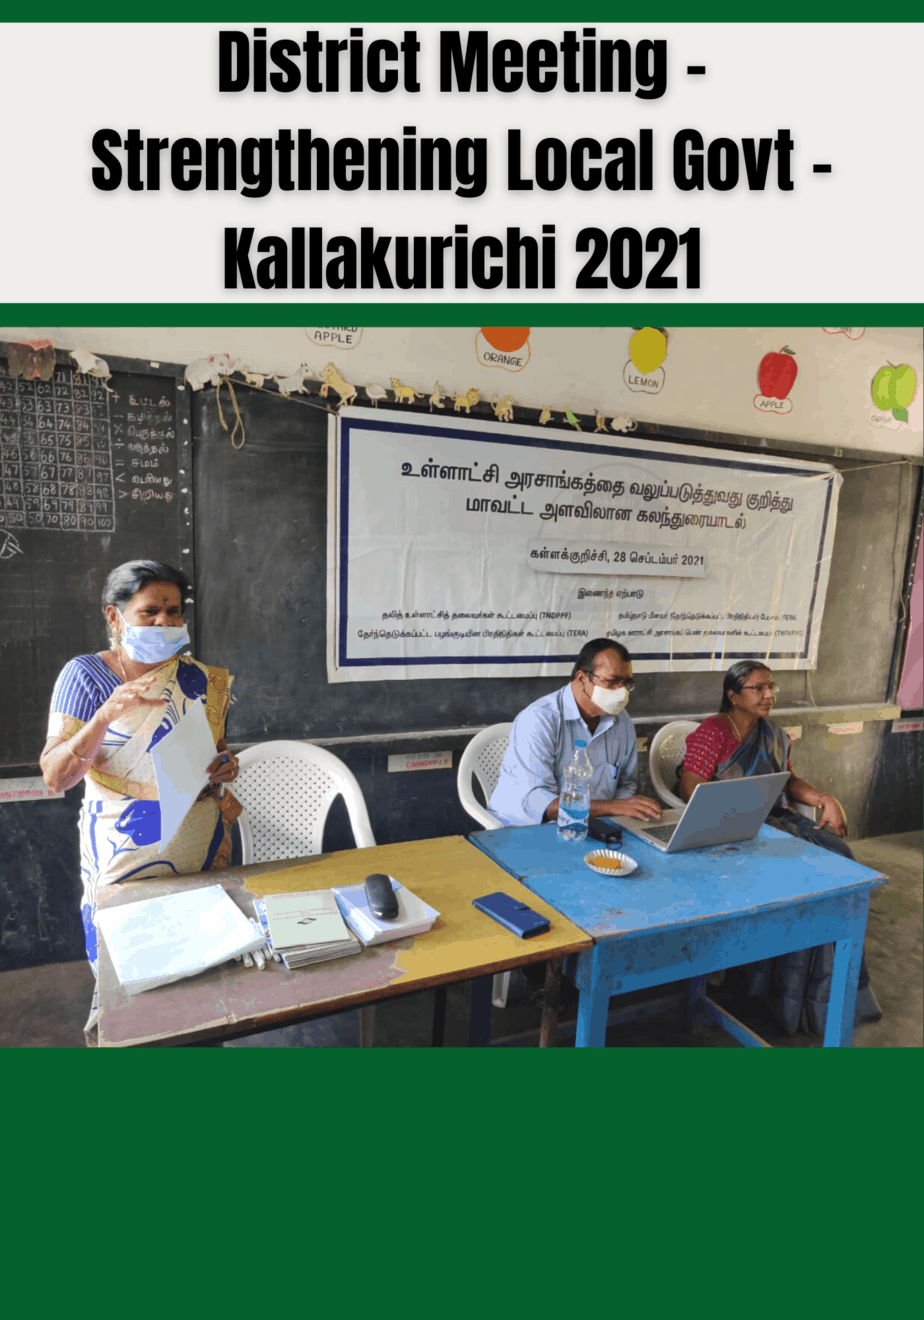 Strengthening local government 2021 – Kallakurichi